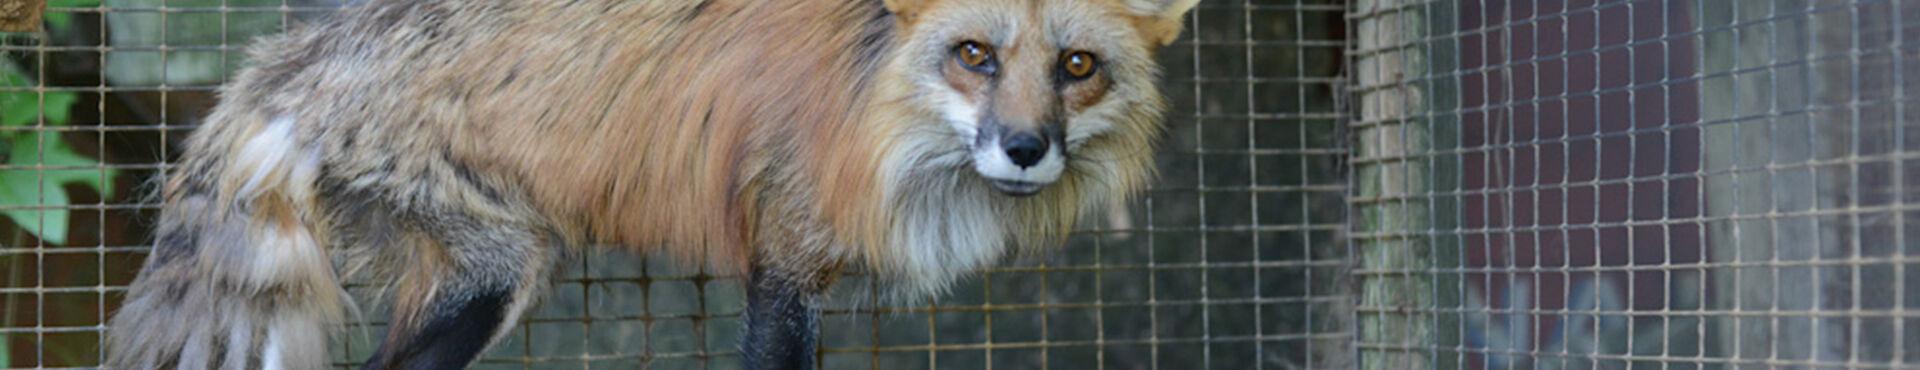 Banner - Investigating Animal Cruelty